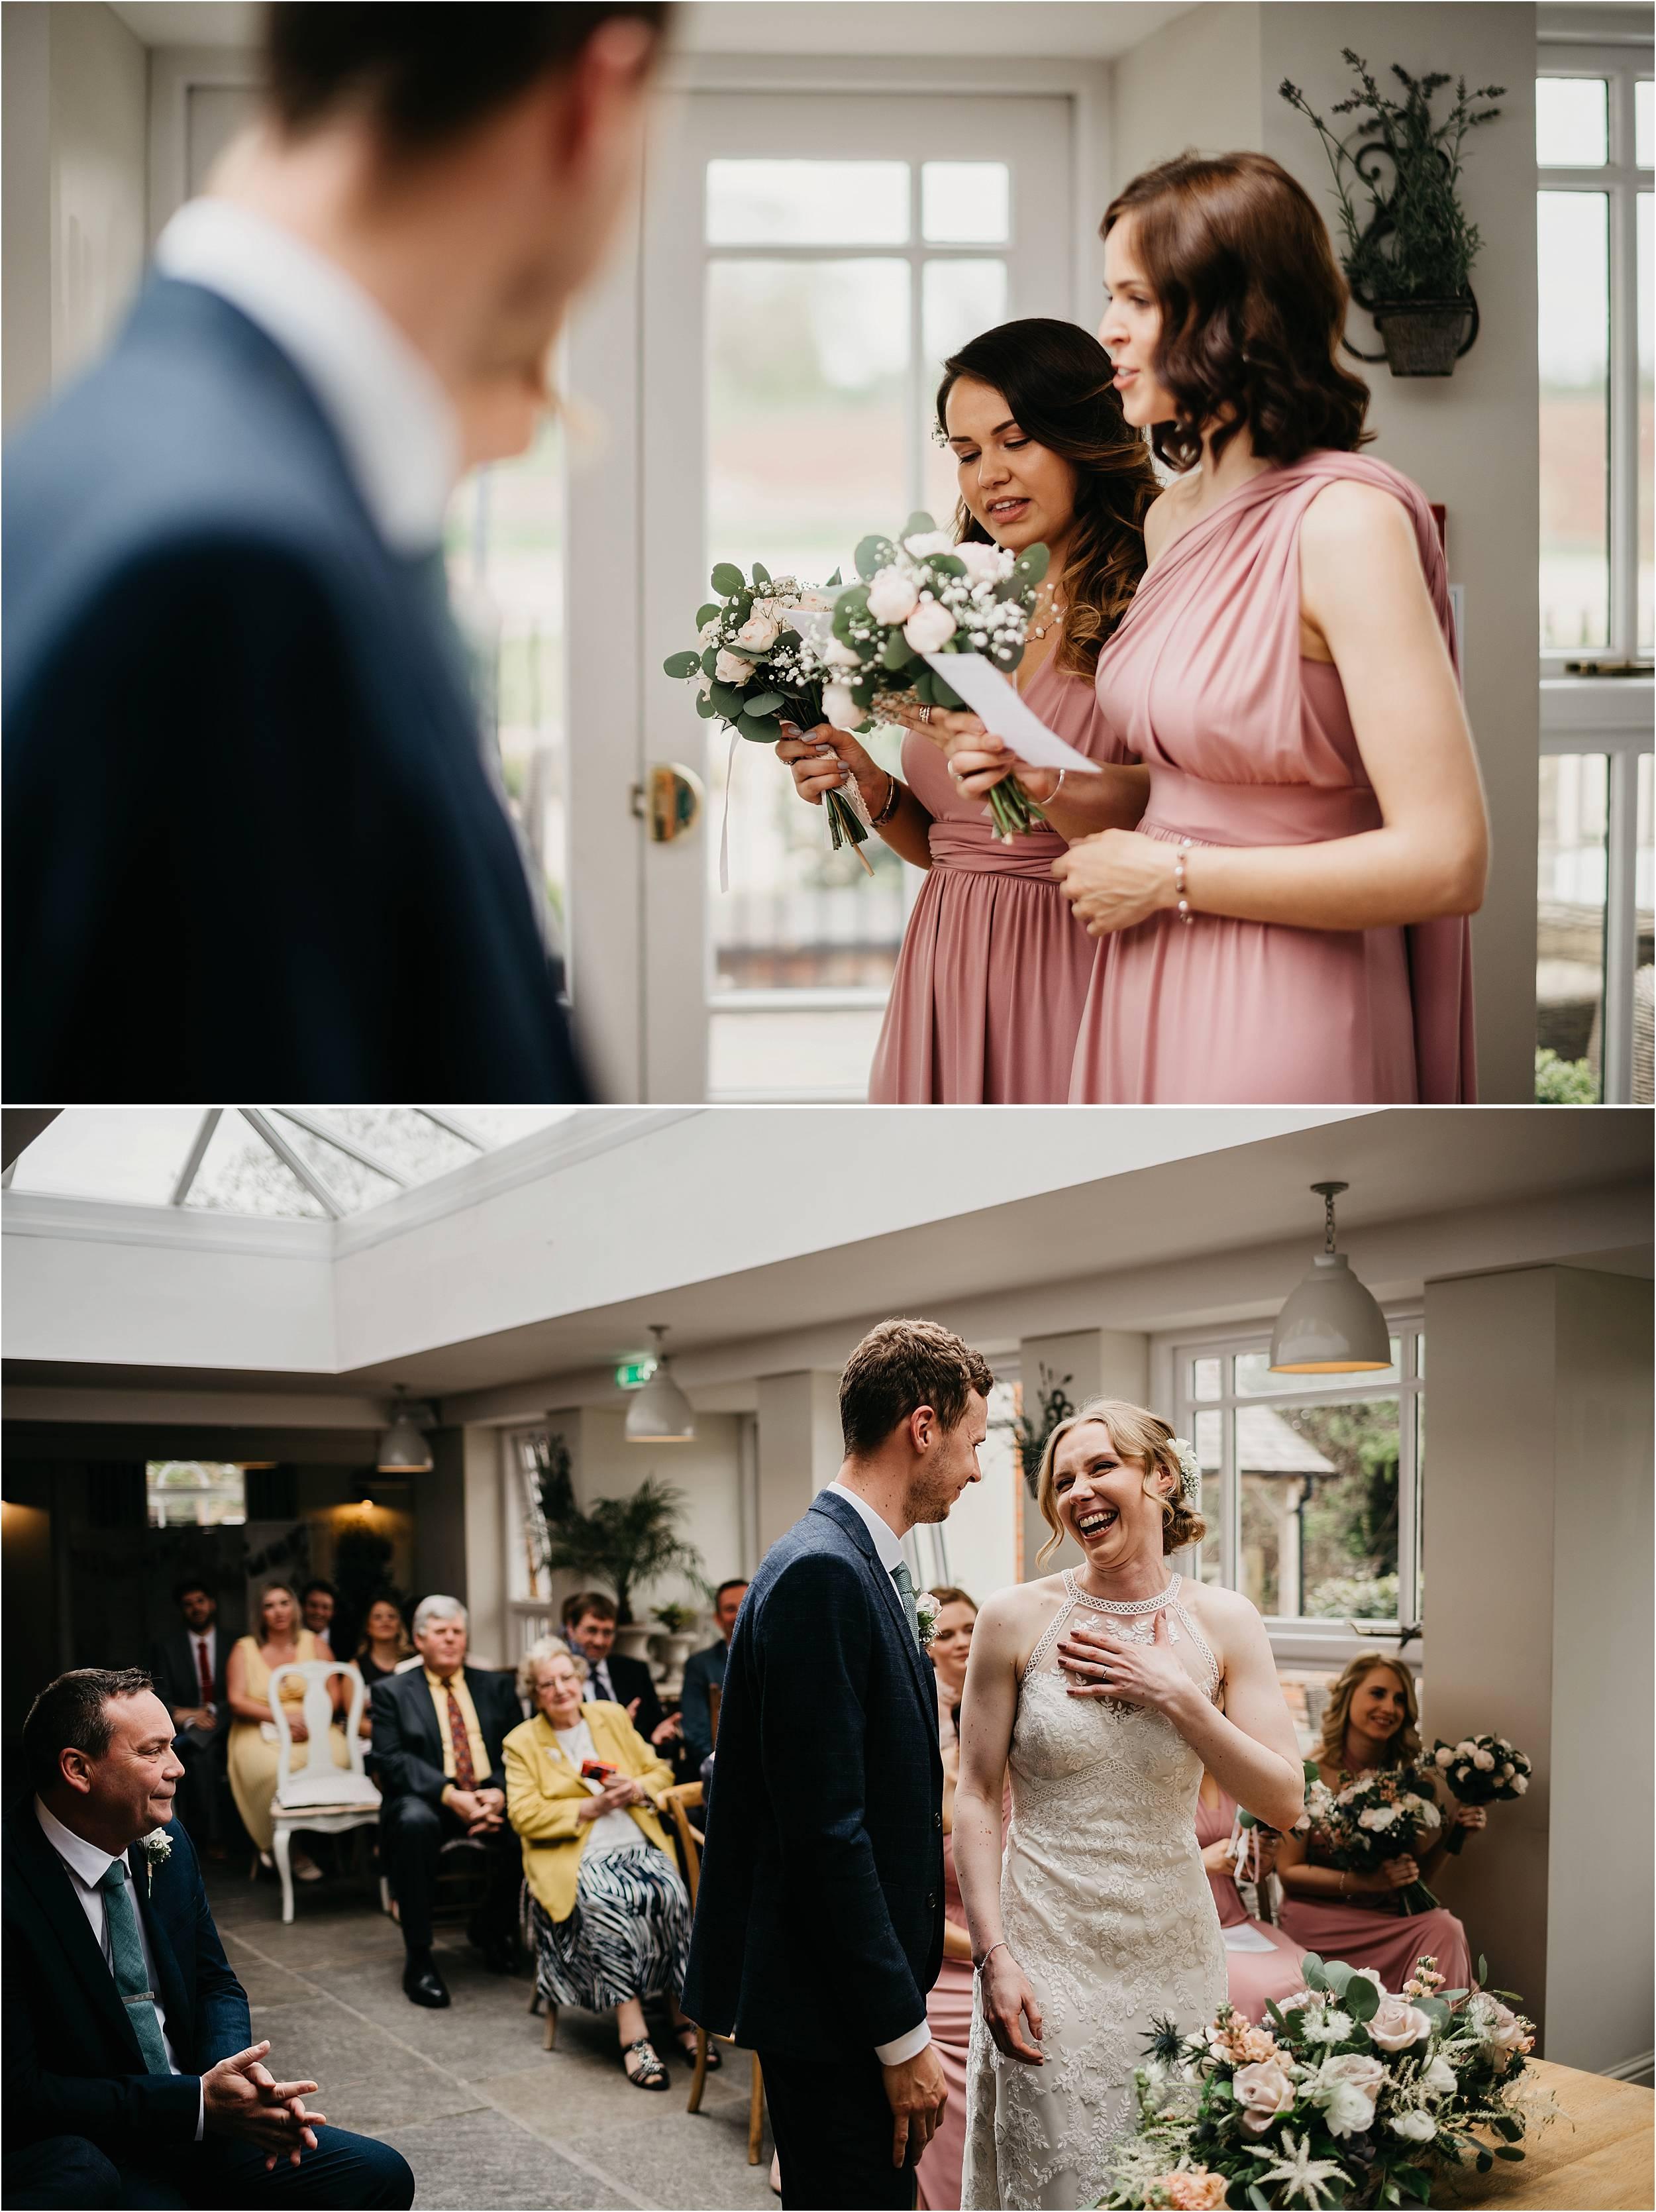 Kedleston Country House Wedding Photography_0051.jpg